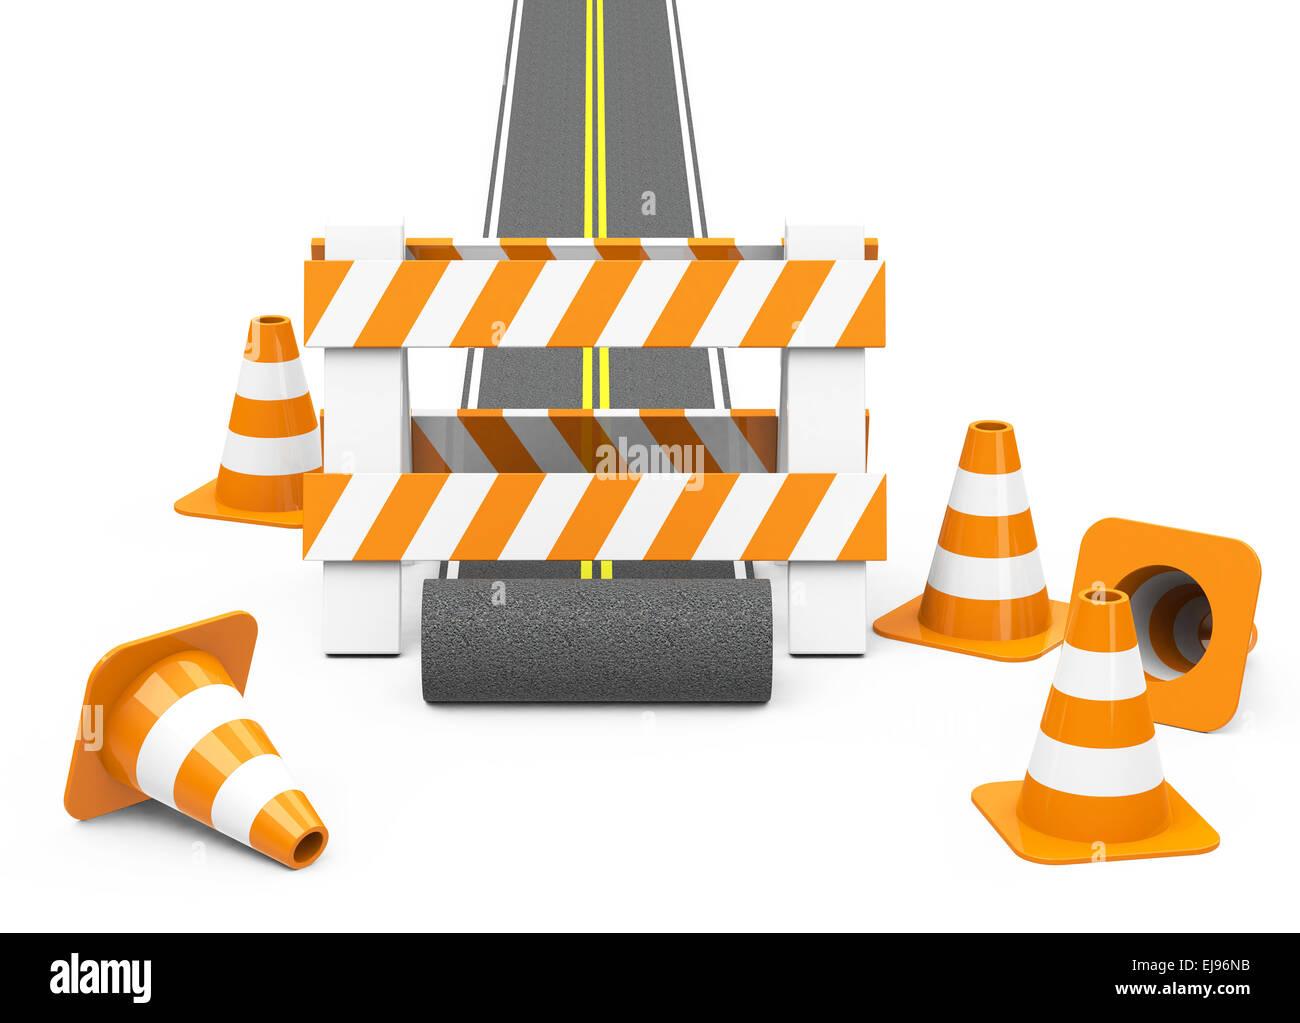 the roadblock - Stock Image